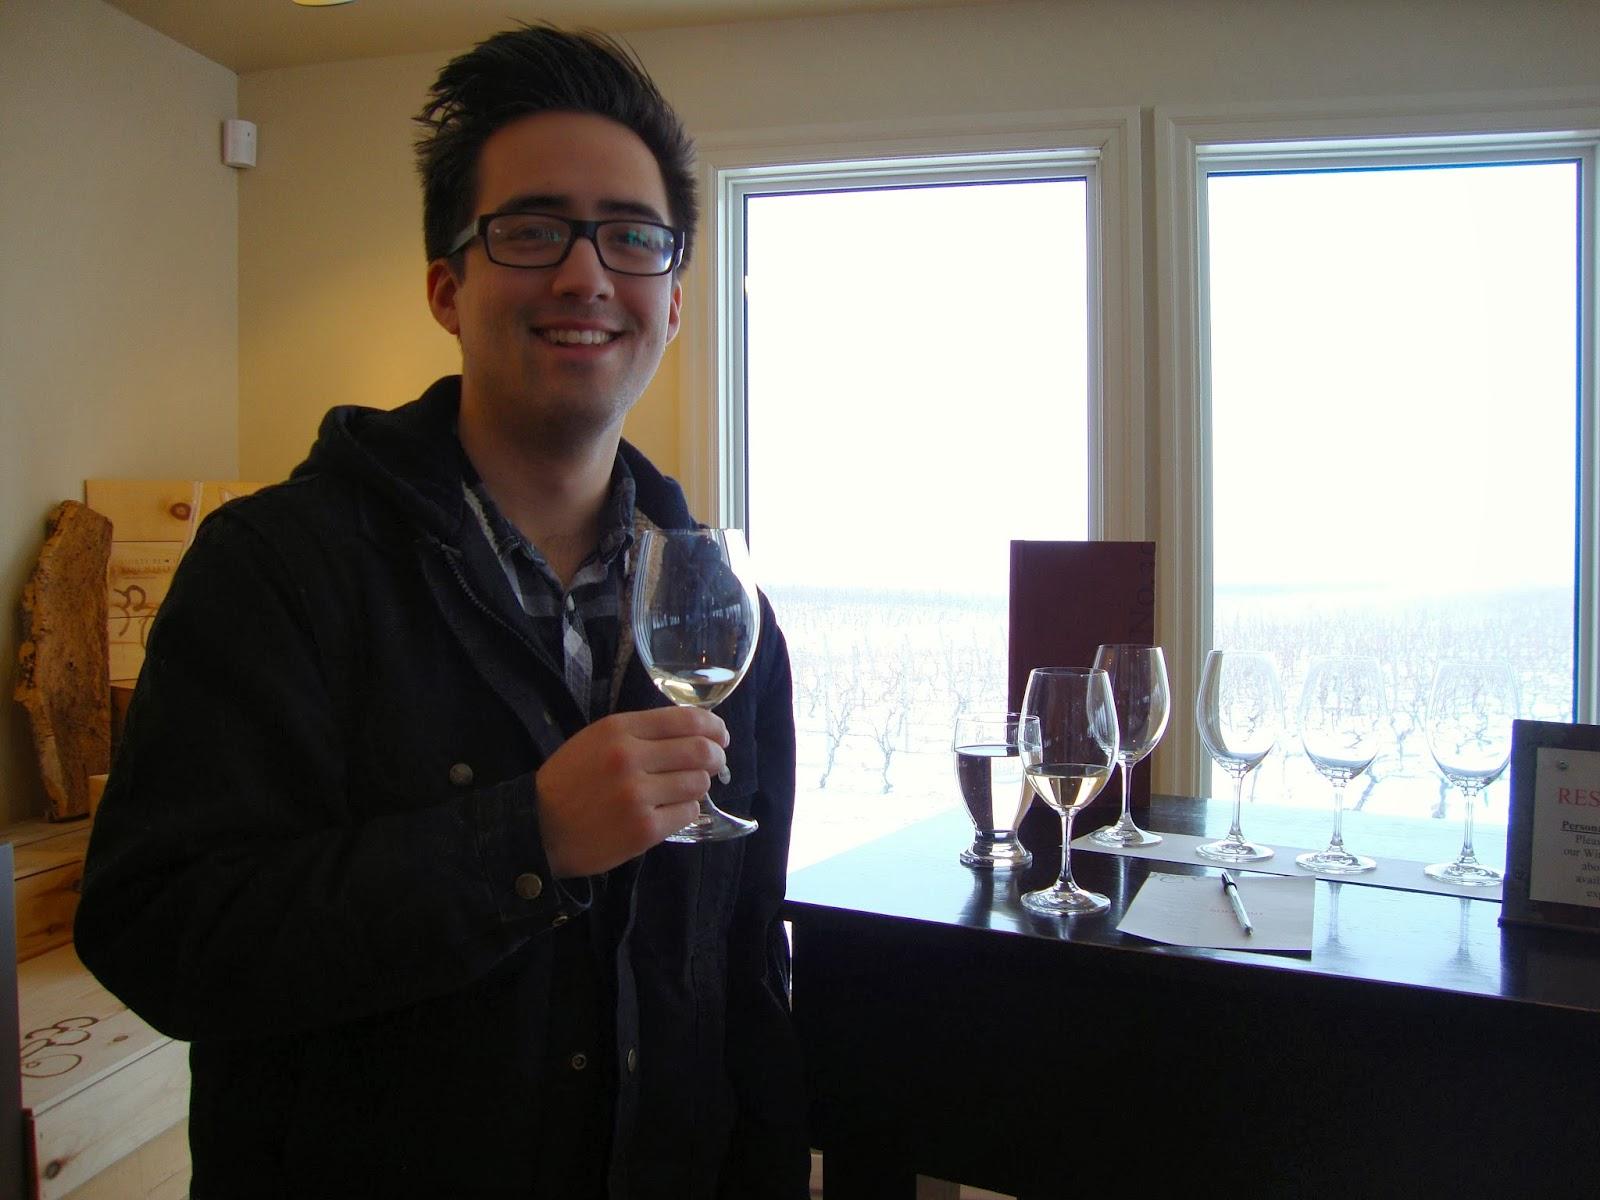 Meet Thomas, my boyfriend and wine tasting partner in crime.